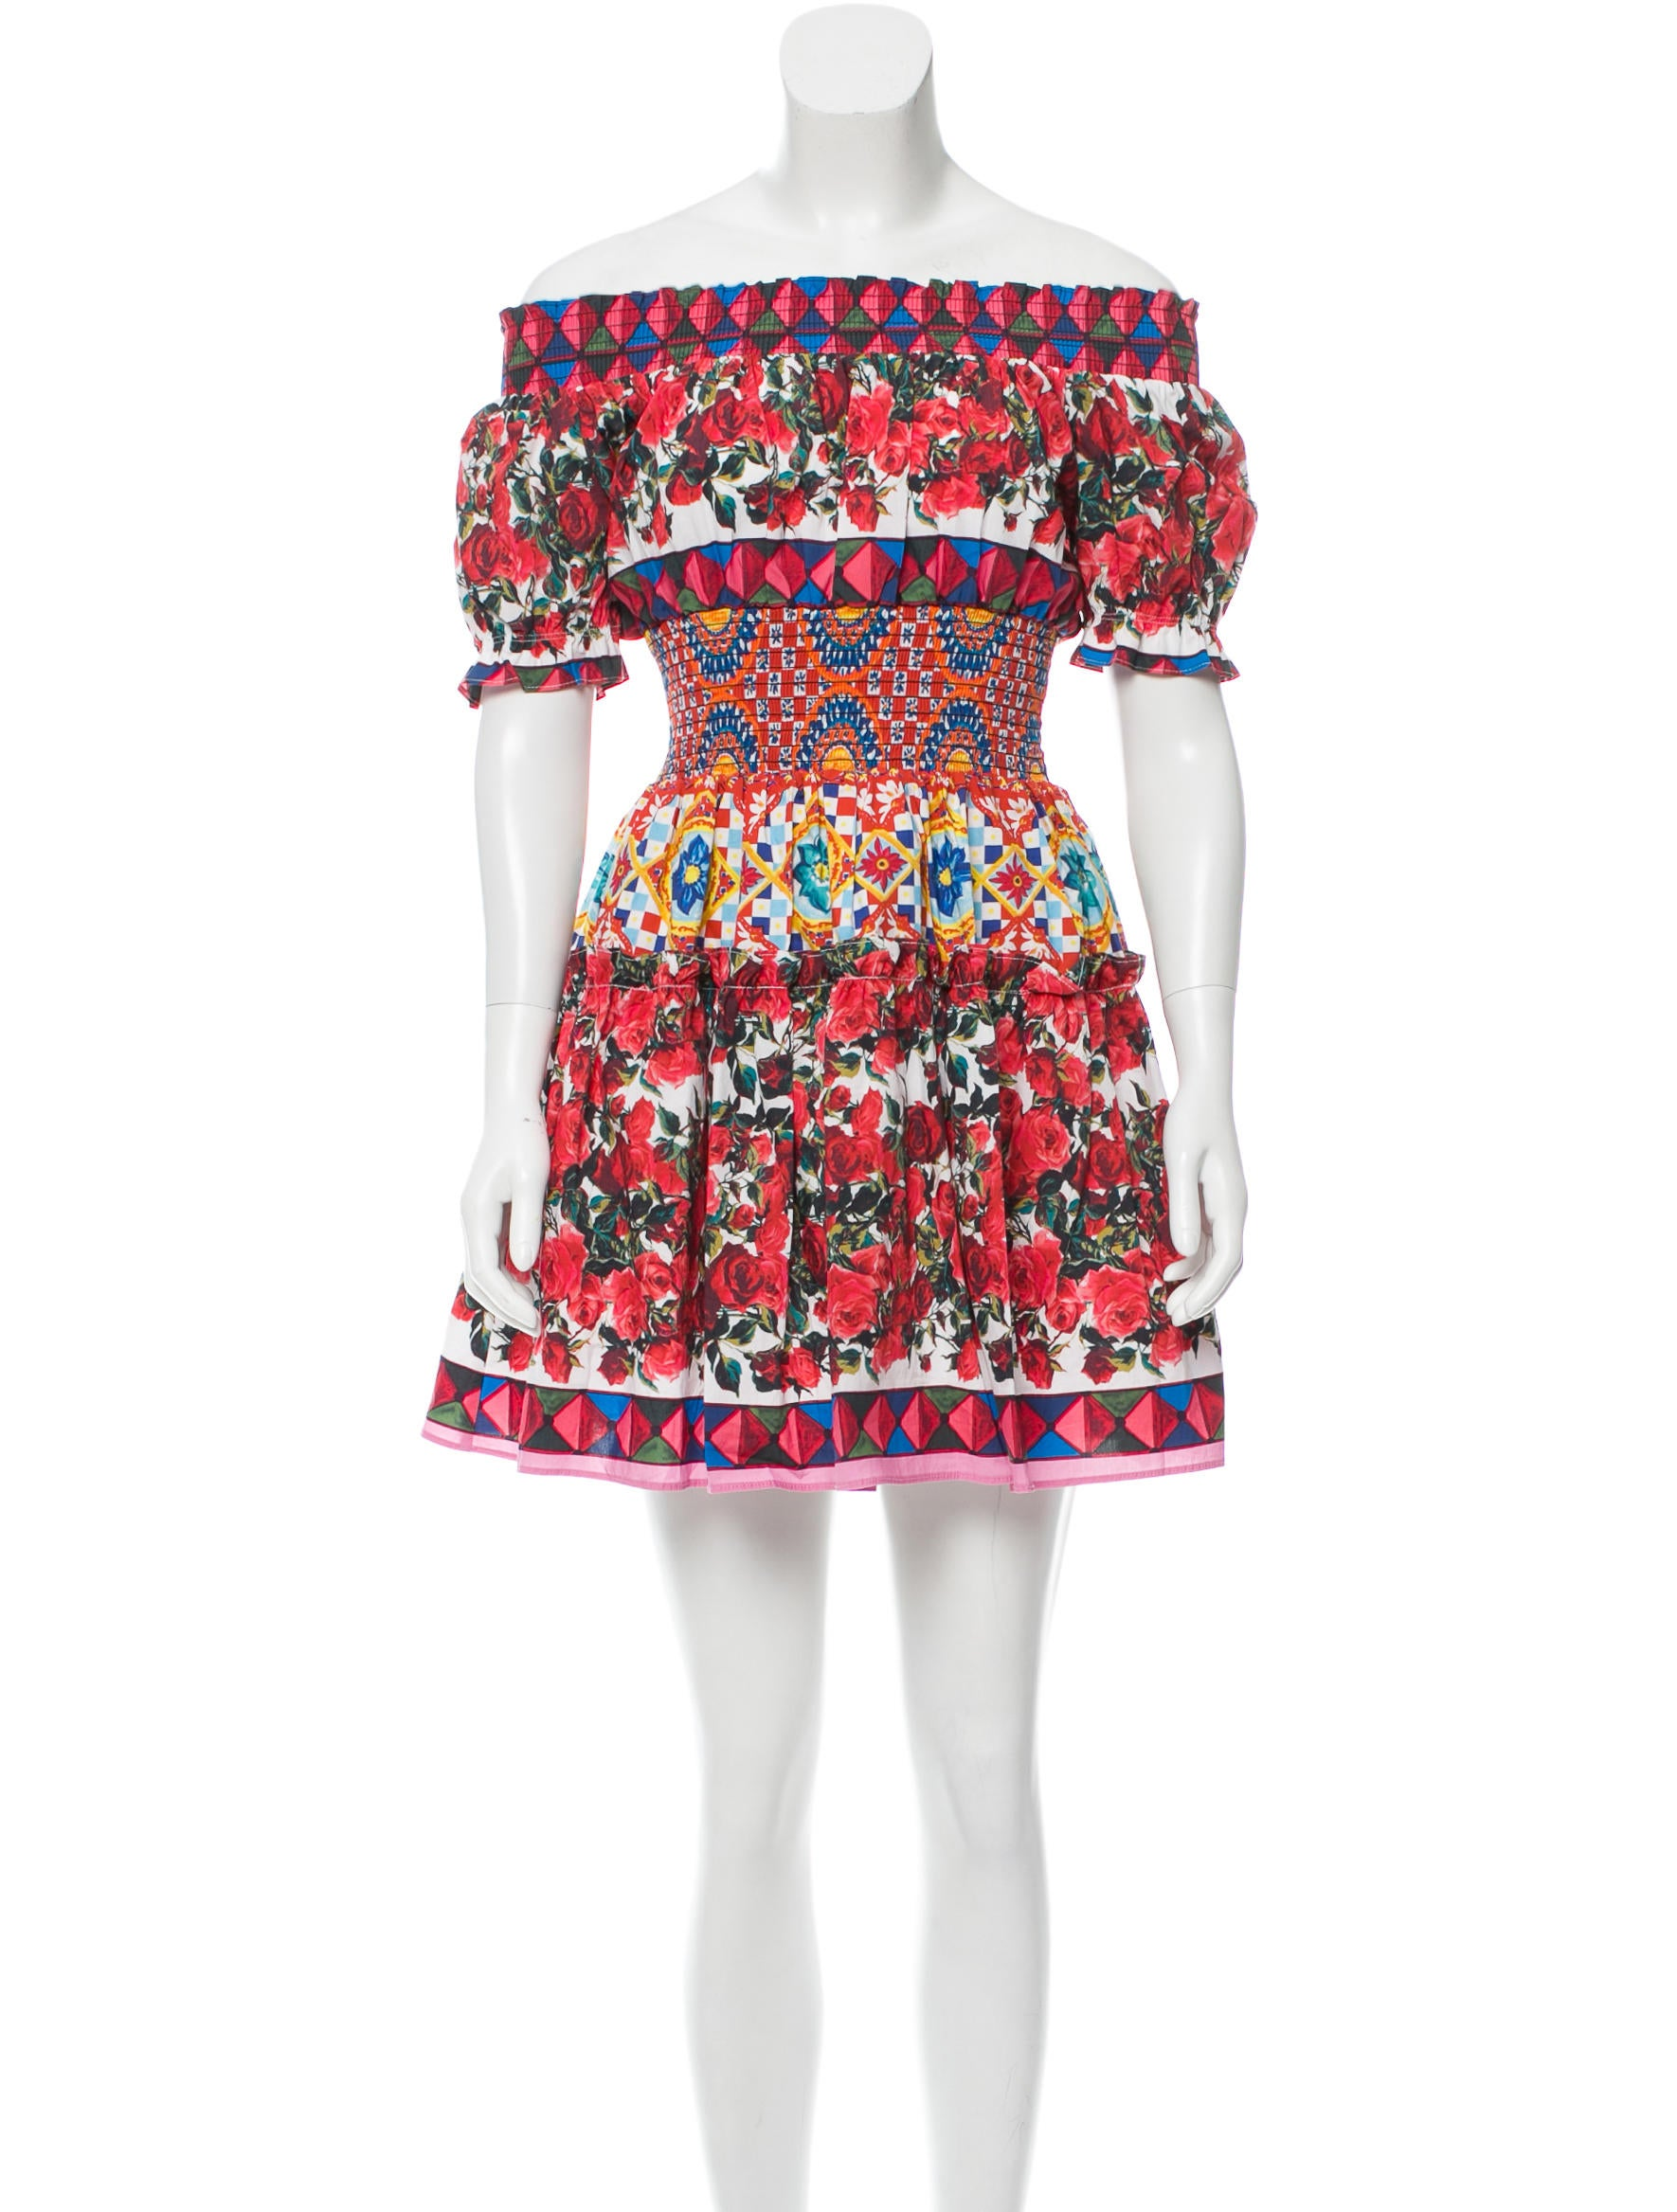 ff179e92 Dolce & Gabbana 2017 Mambo Print Dress - Clothing - DAG75017 | The ...